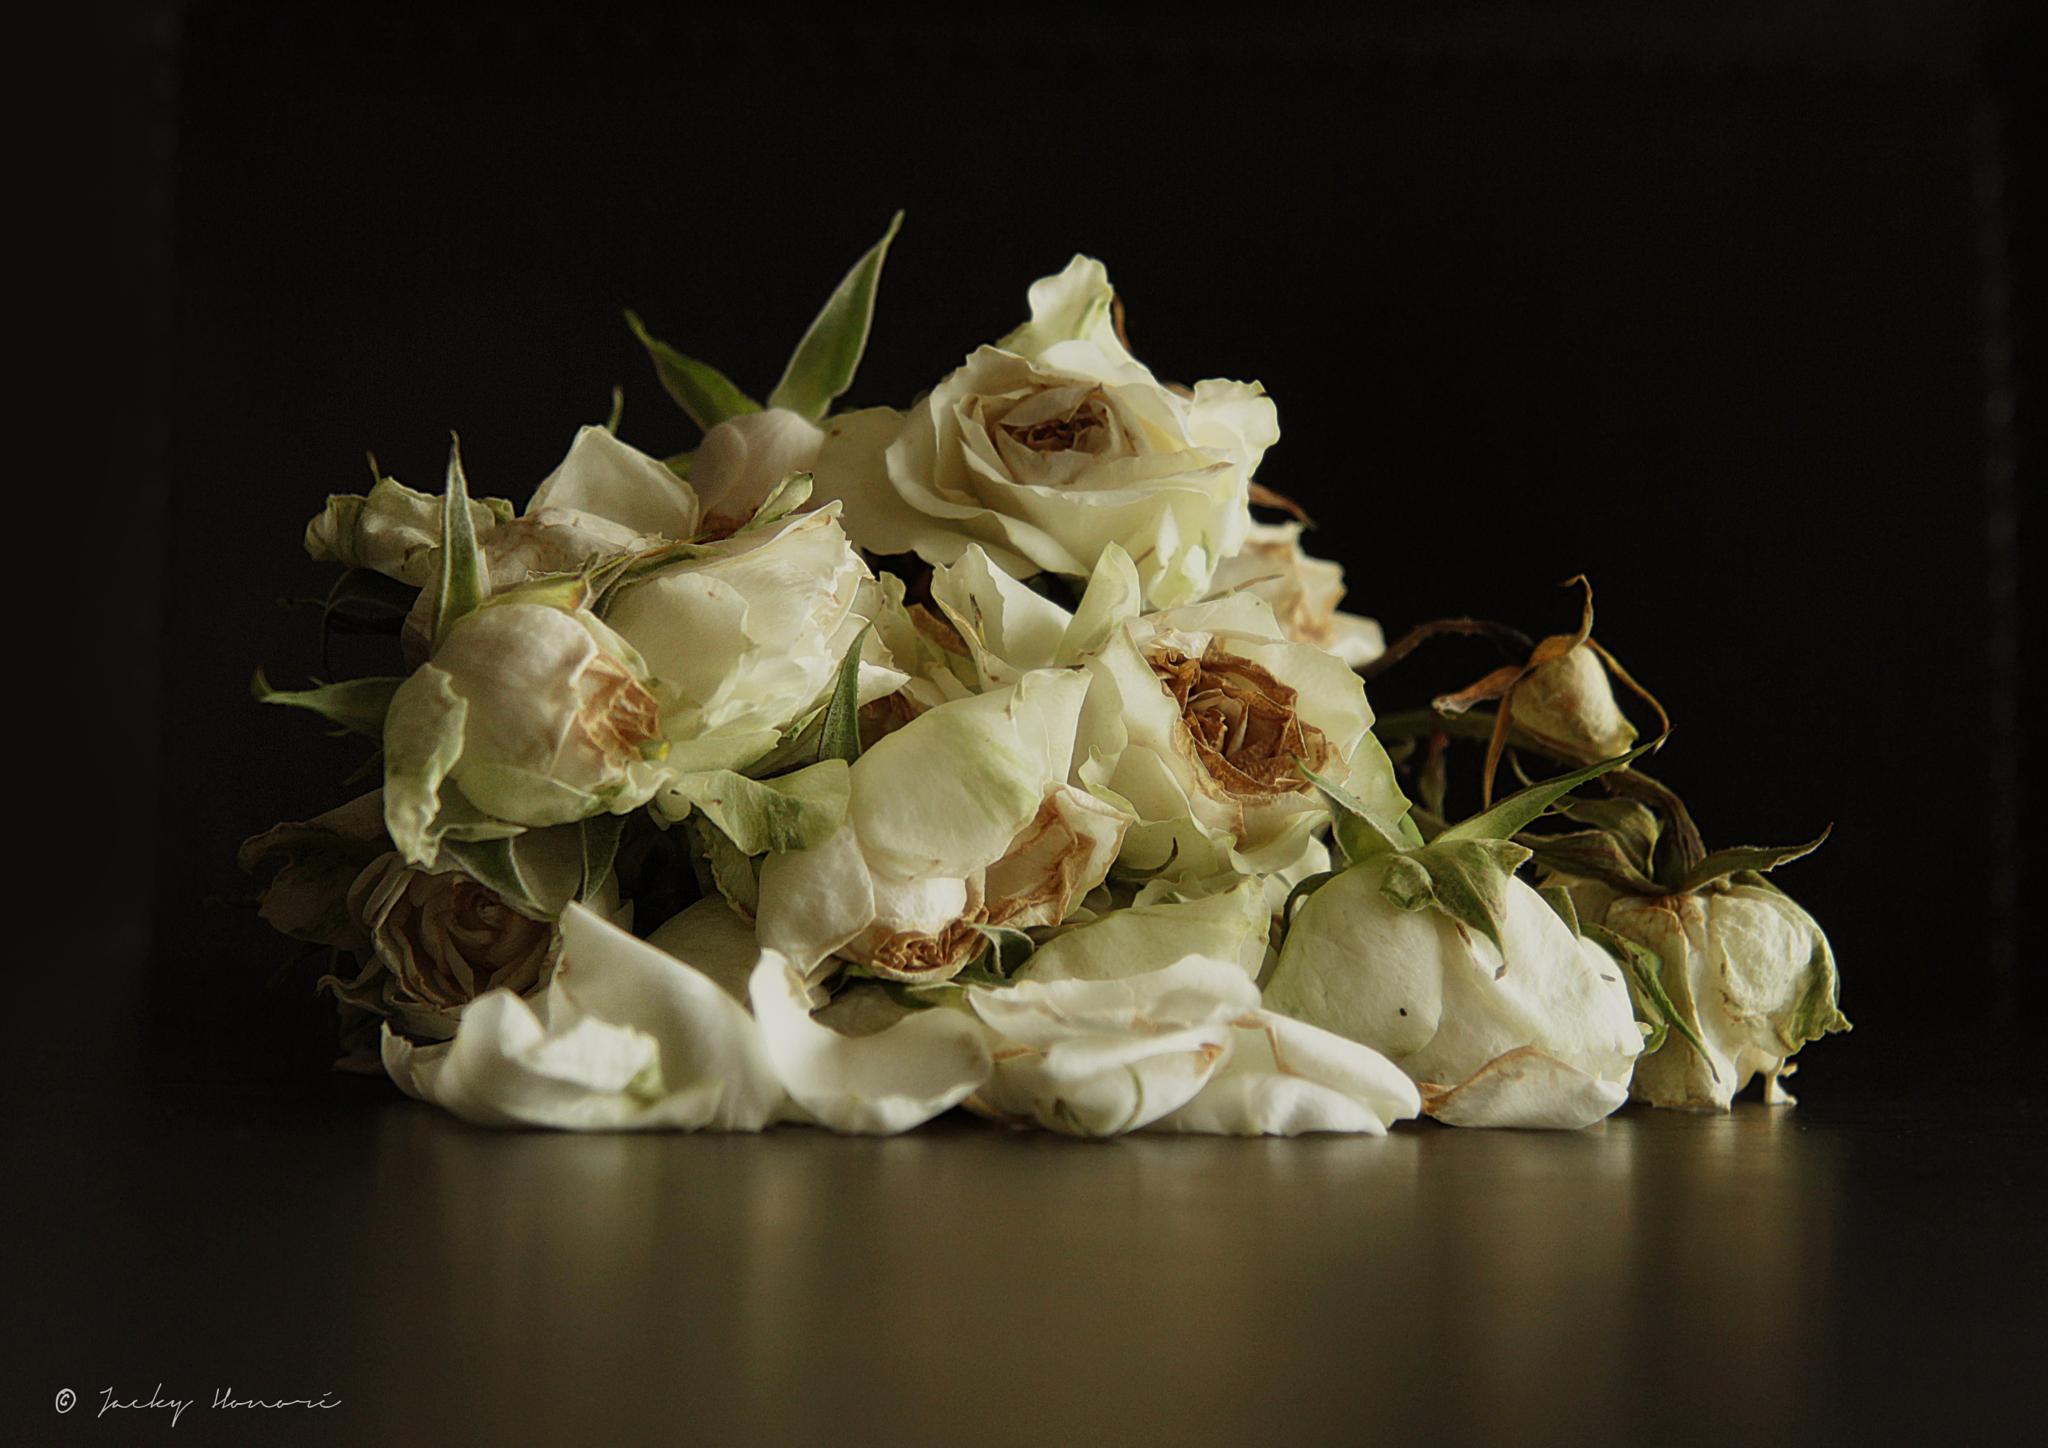 Flowers02 by Jacky Honoré